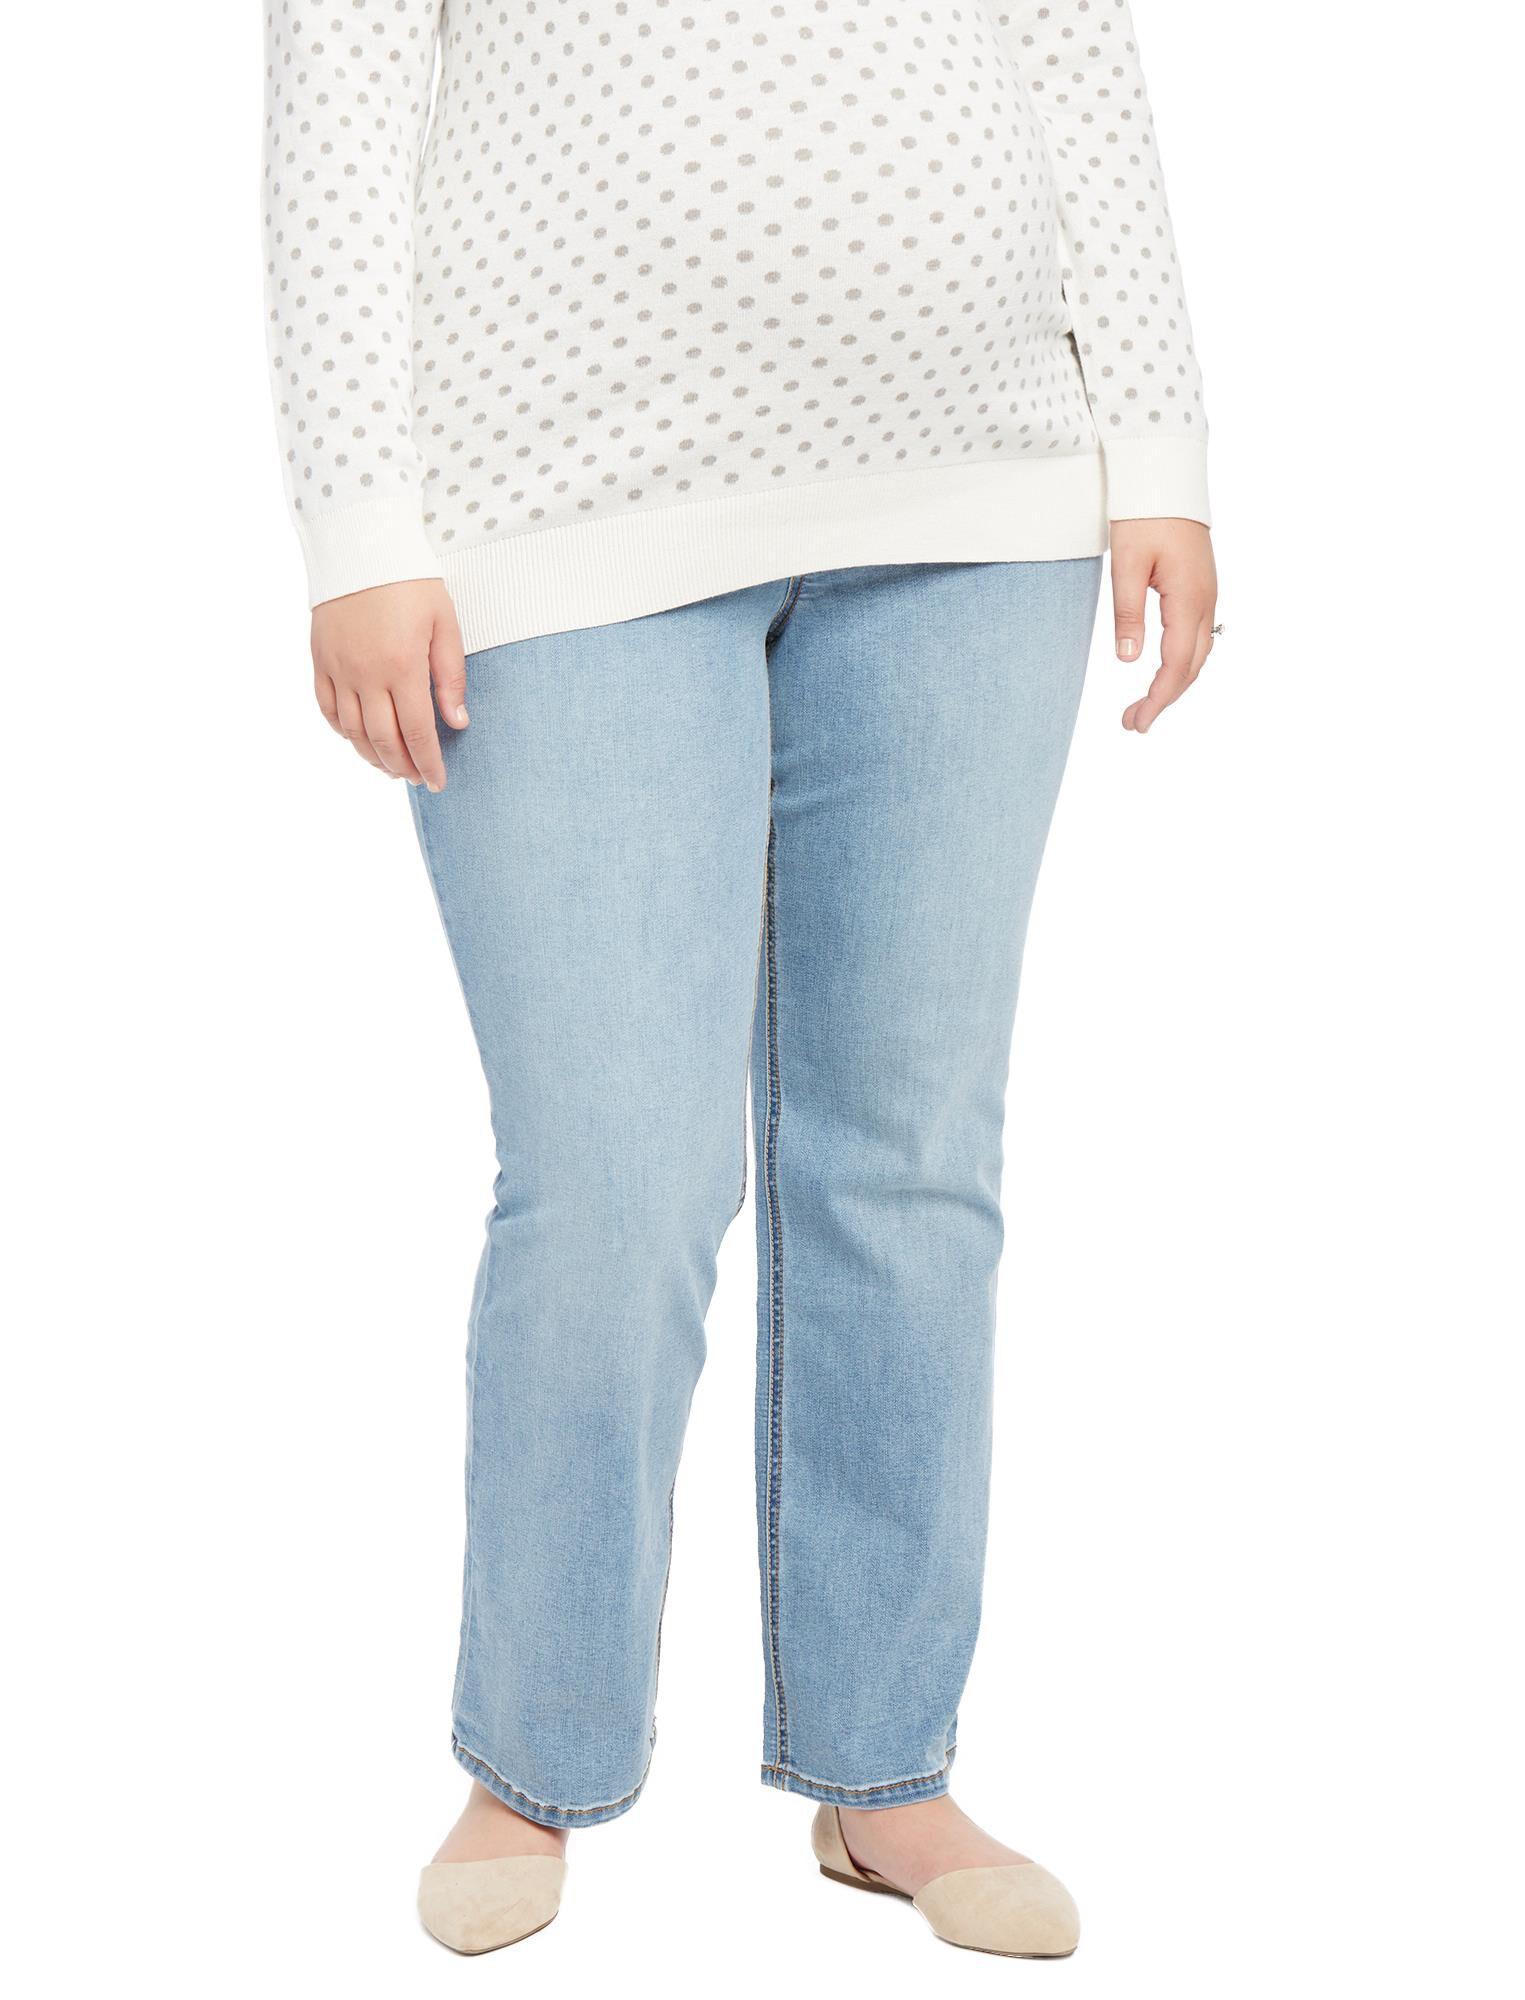 Jessica Simpson Plus Size Secret Fit Belly Boot Maternity Jeans- Light Wash